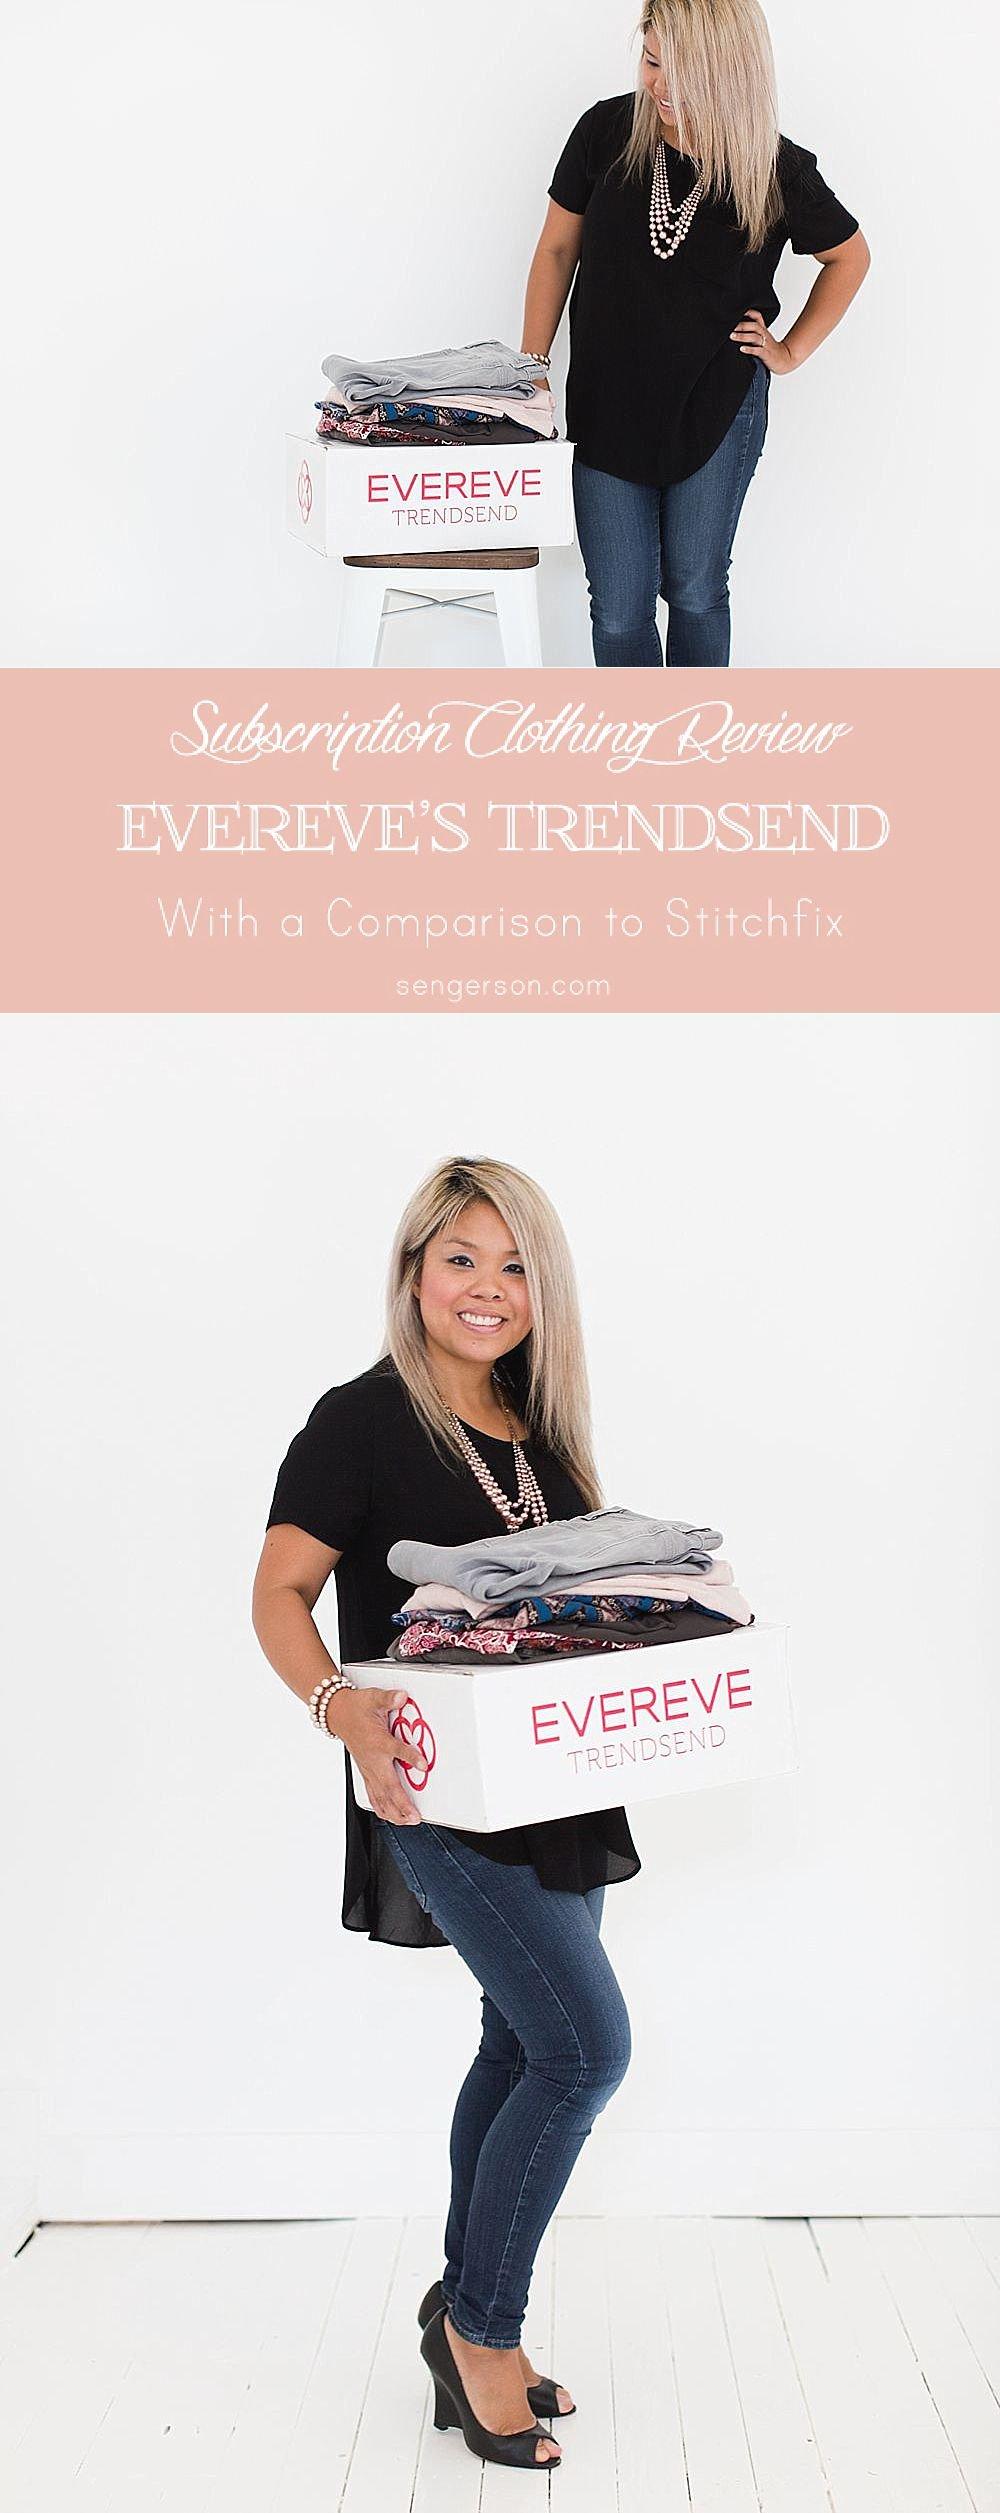 evereve trendsend review